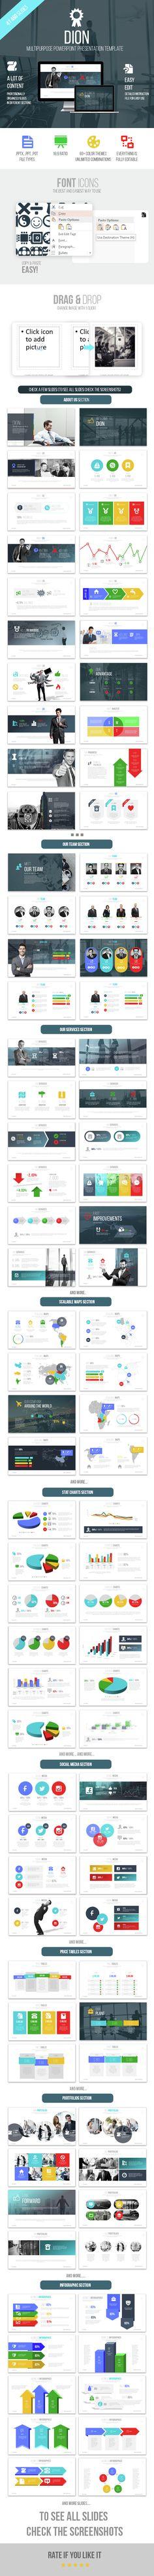 ELEVATOR Multipurpose PowerPoint Presentation Template Pinterest - Awesome logo presentation template scheme